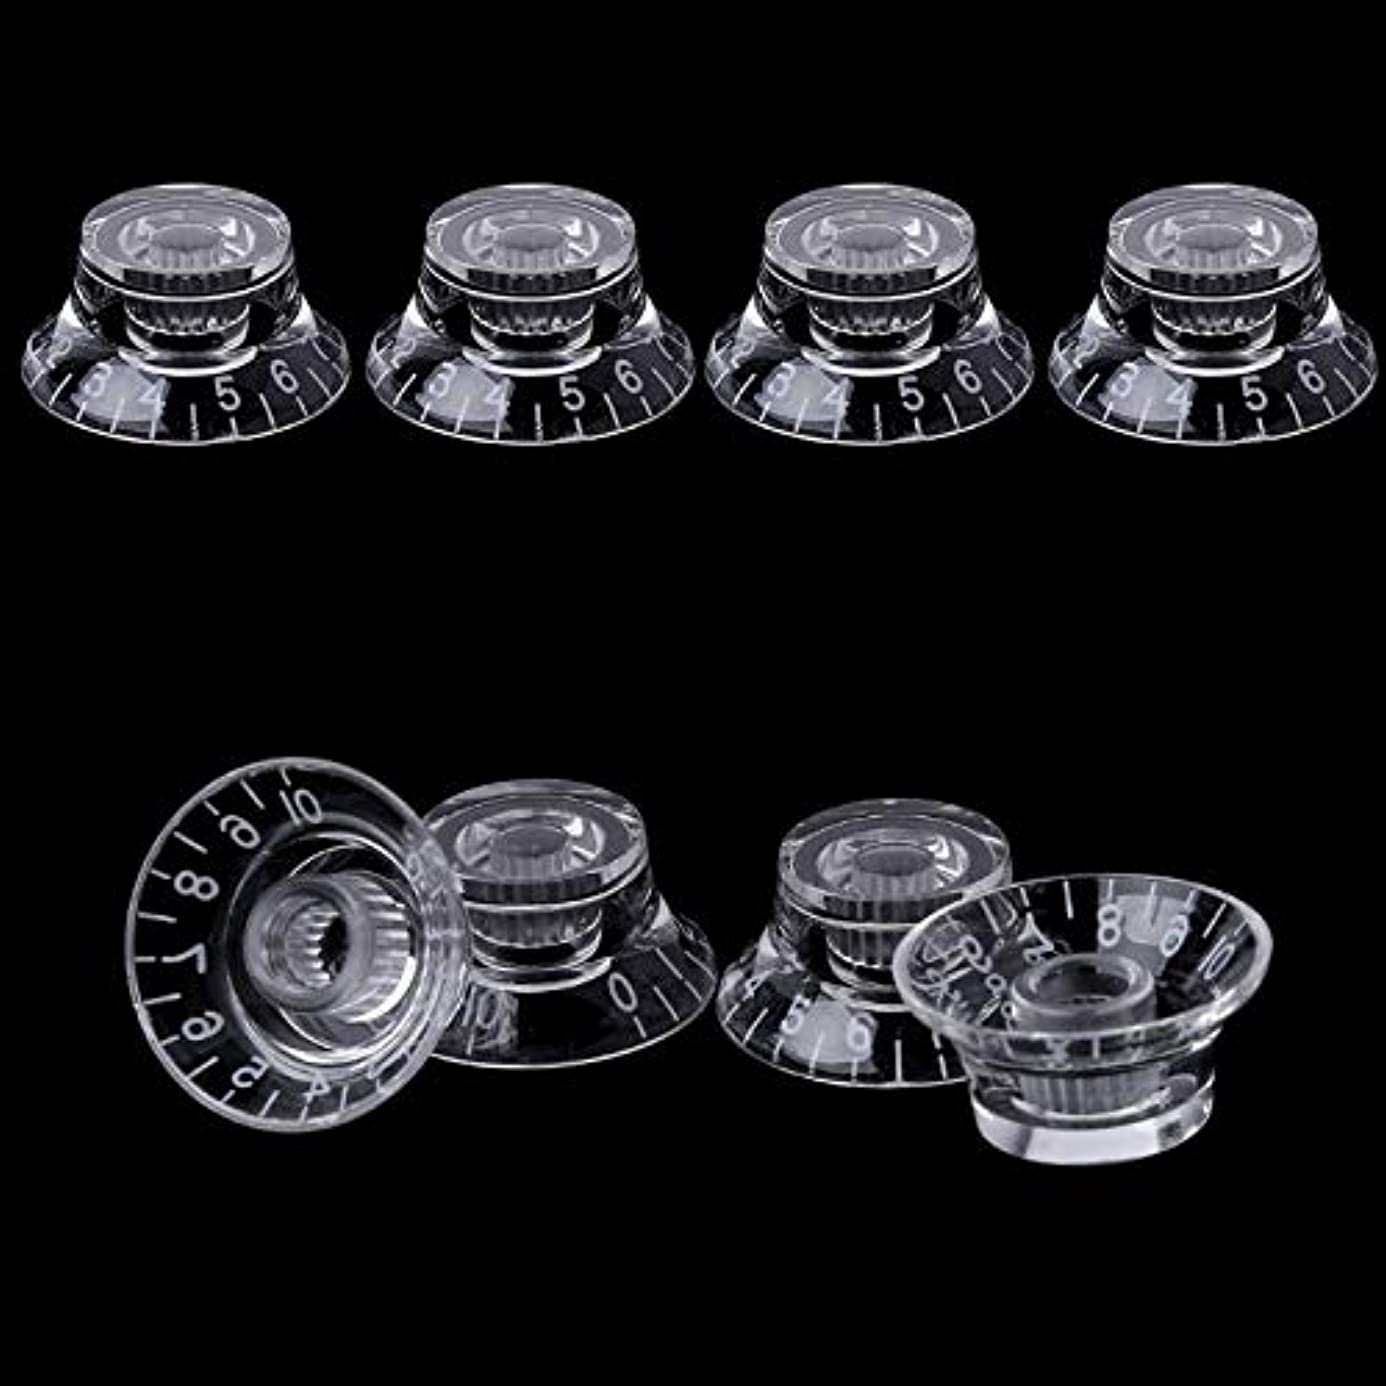 Susie-Smile - 1pc Knob Button Bell Shape Guitar Tone Volume Control For LP Guitar Parts Transparent White